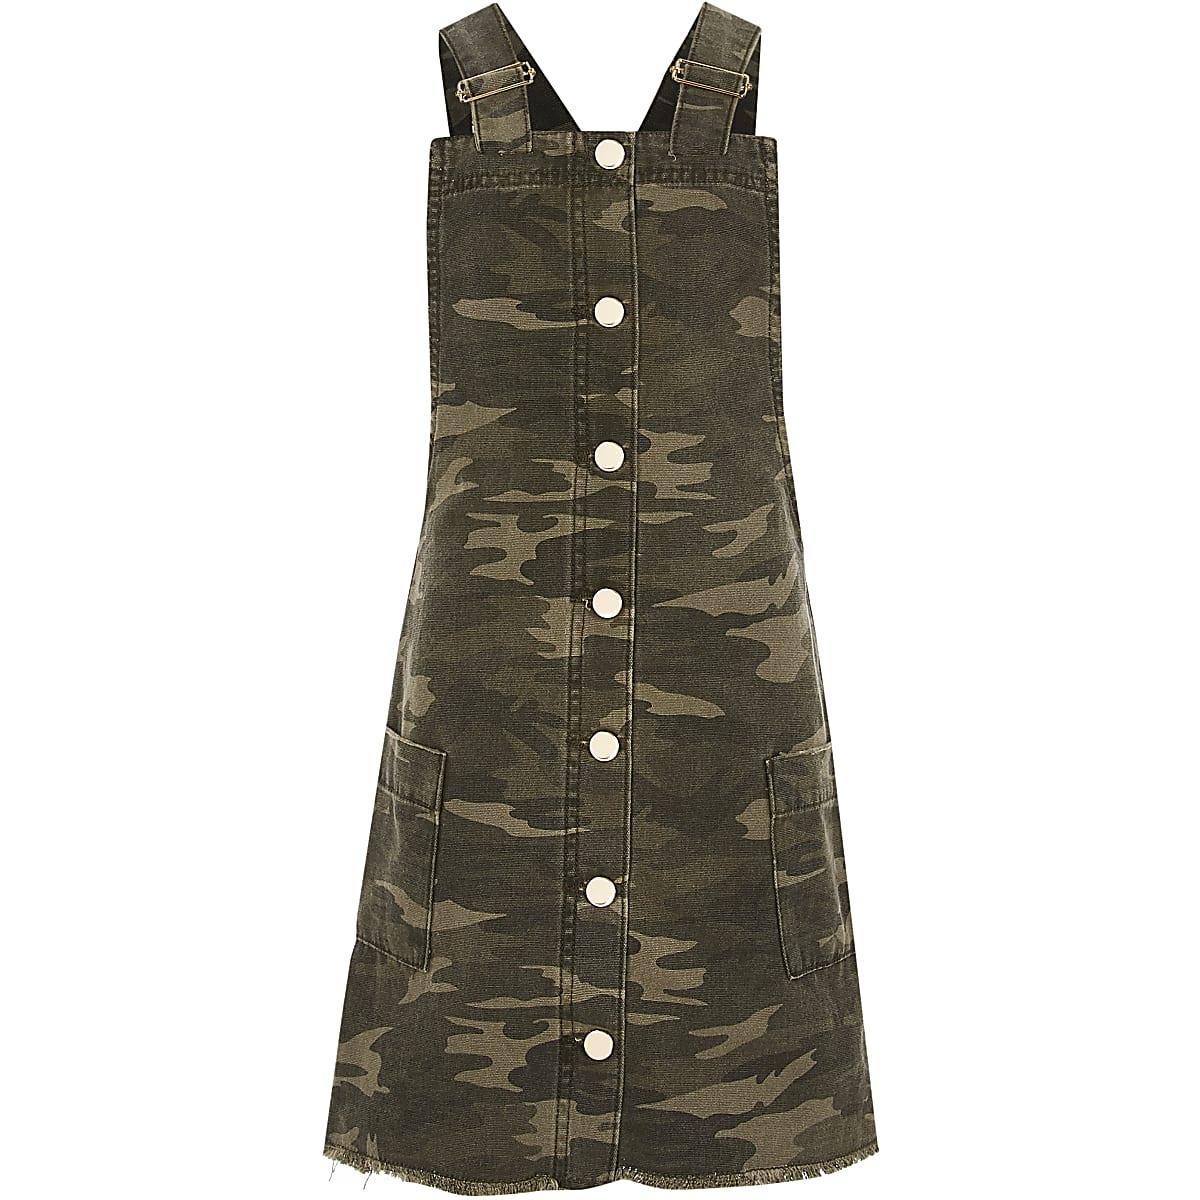 Girls green camo pinafore dress